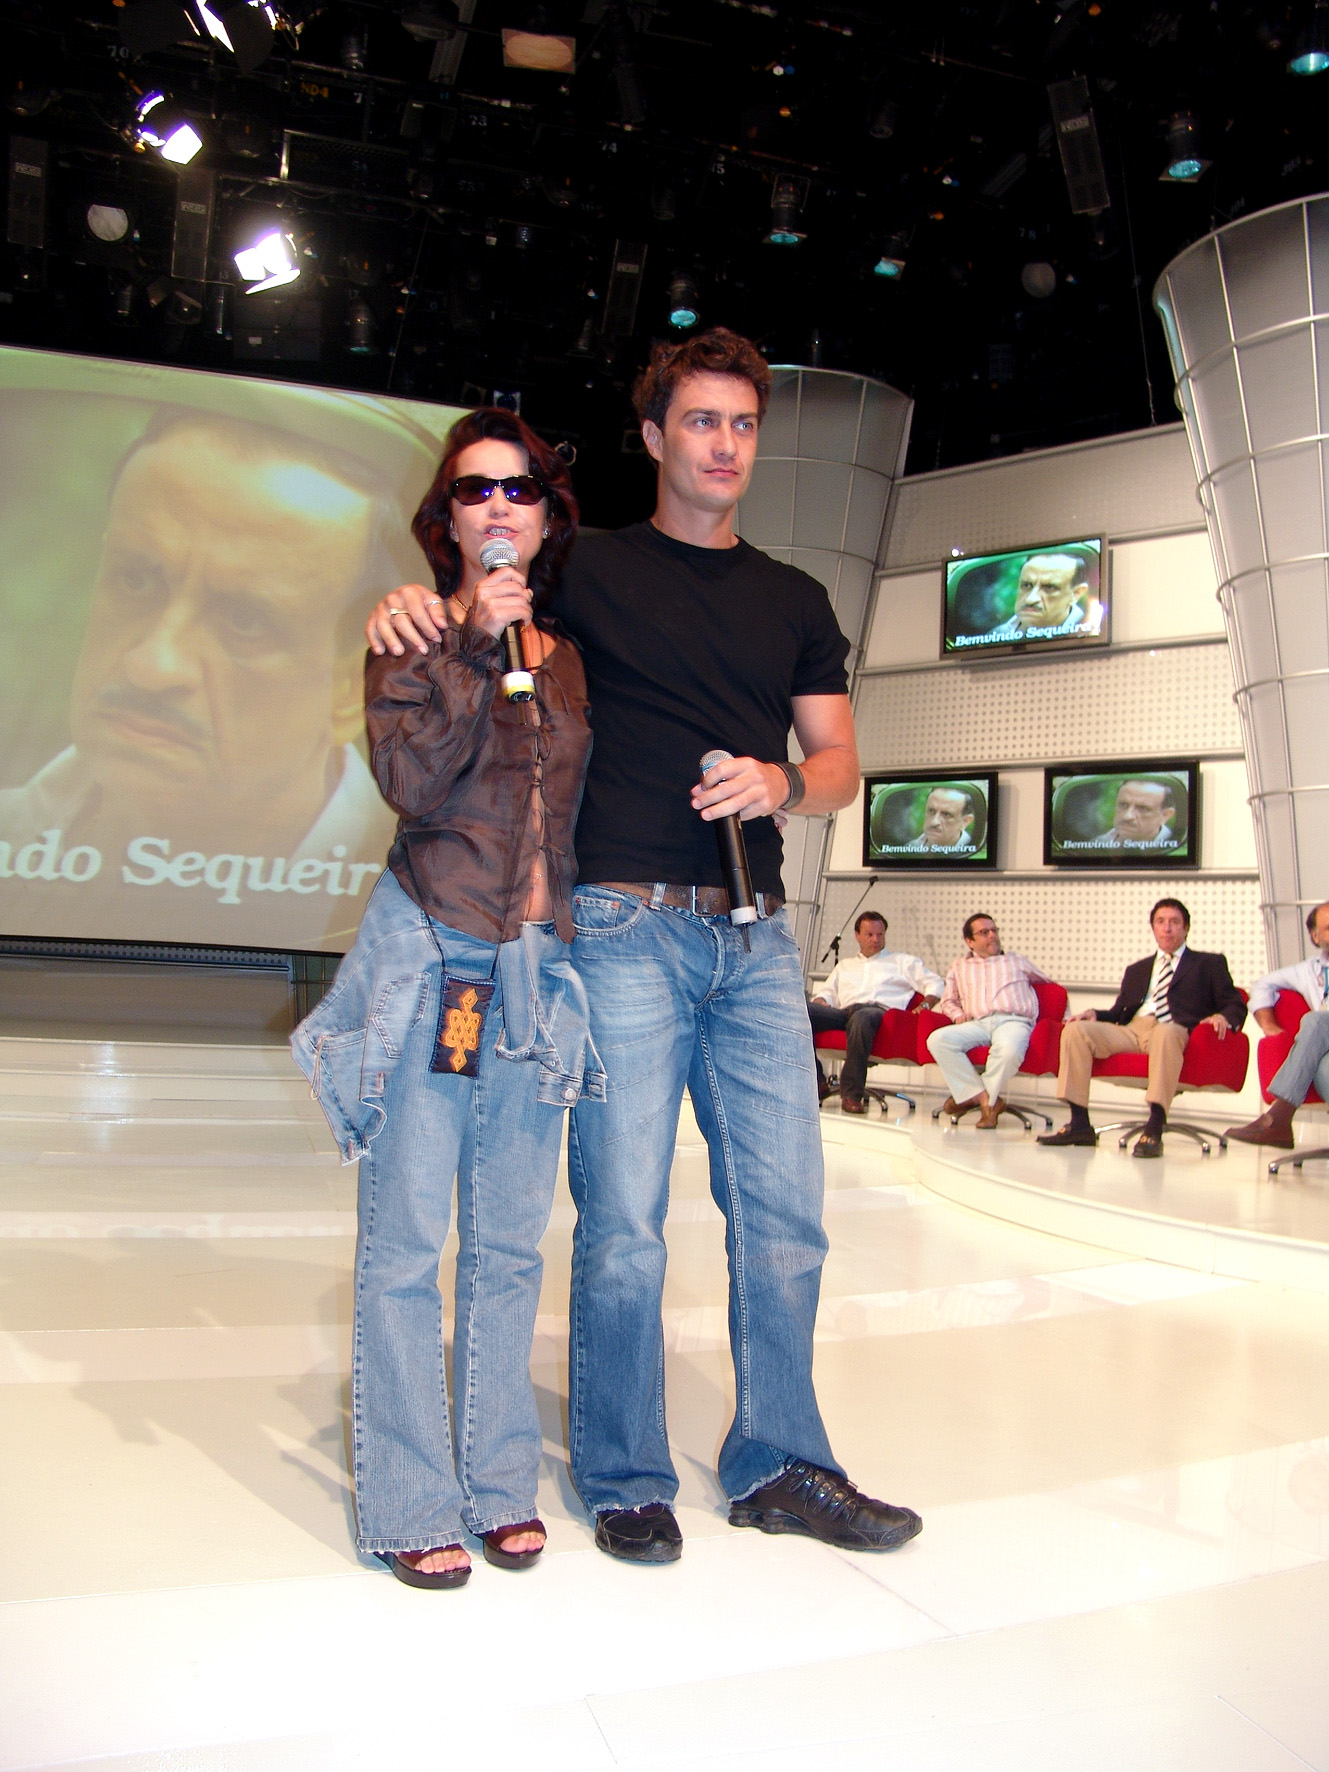 http://upload.wikimedia.org/wikipedia/commons/3/3e/Lucelia_e_Gabriel_Braga_Nunes.jpg